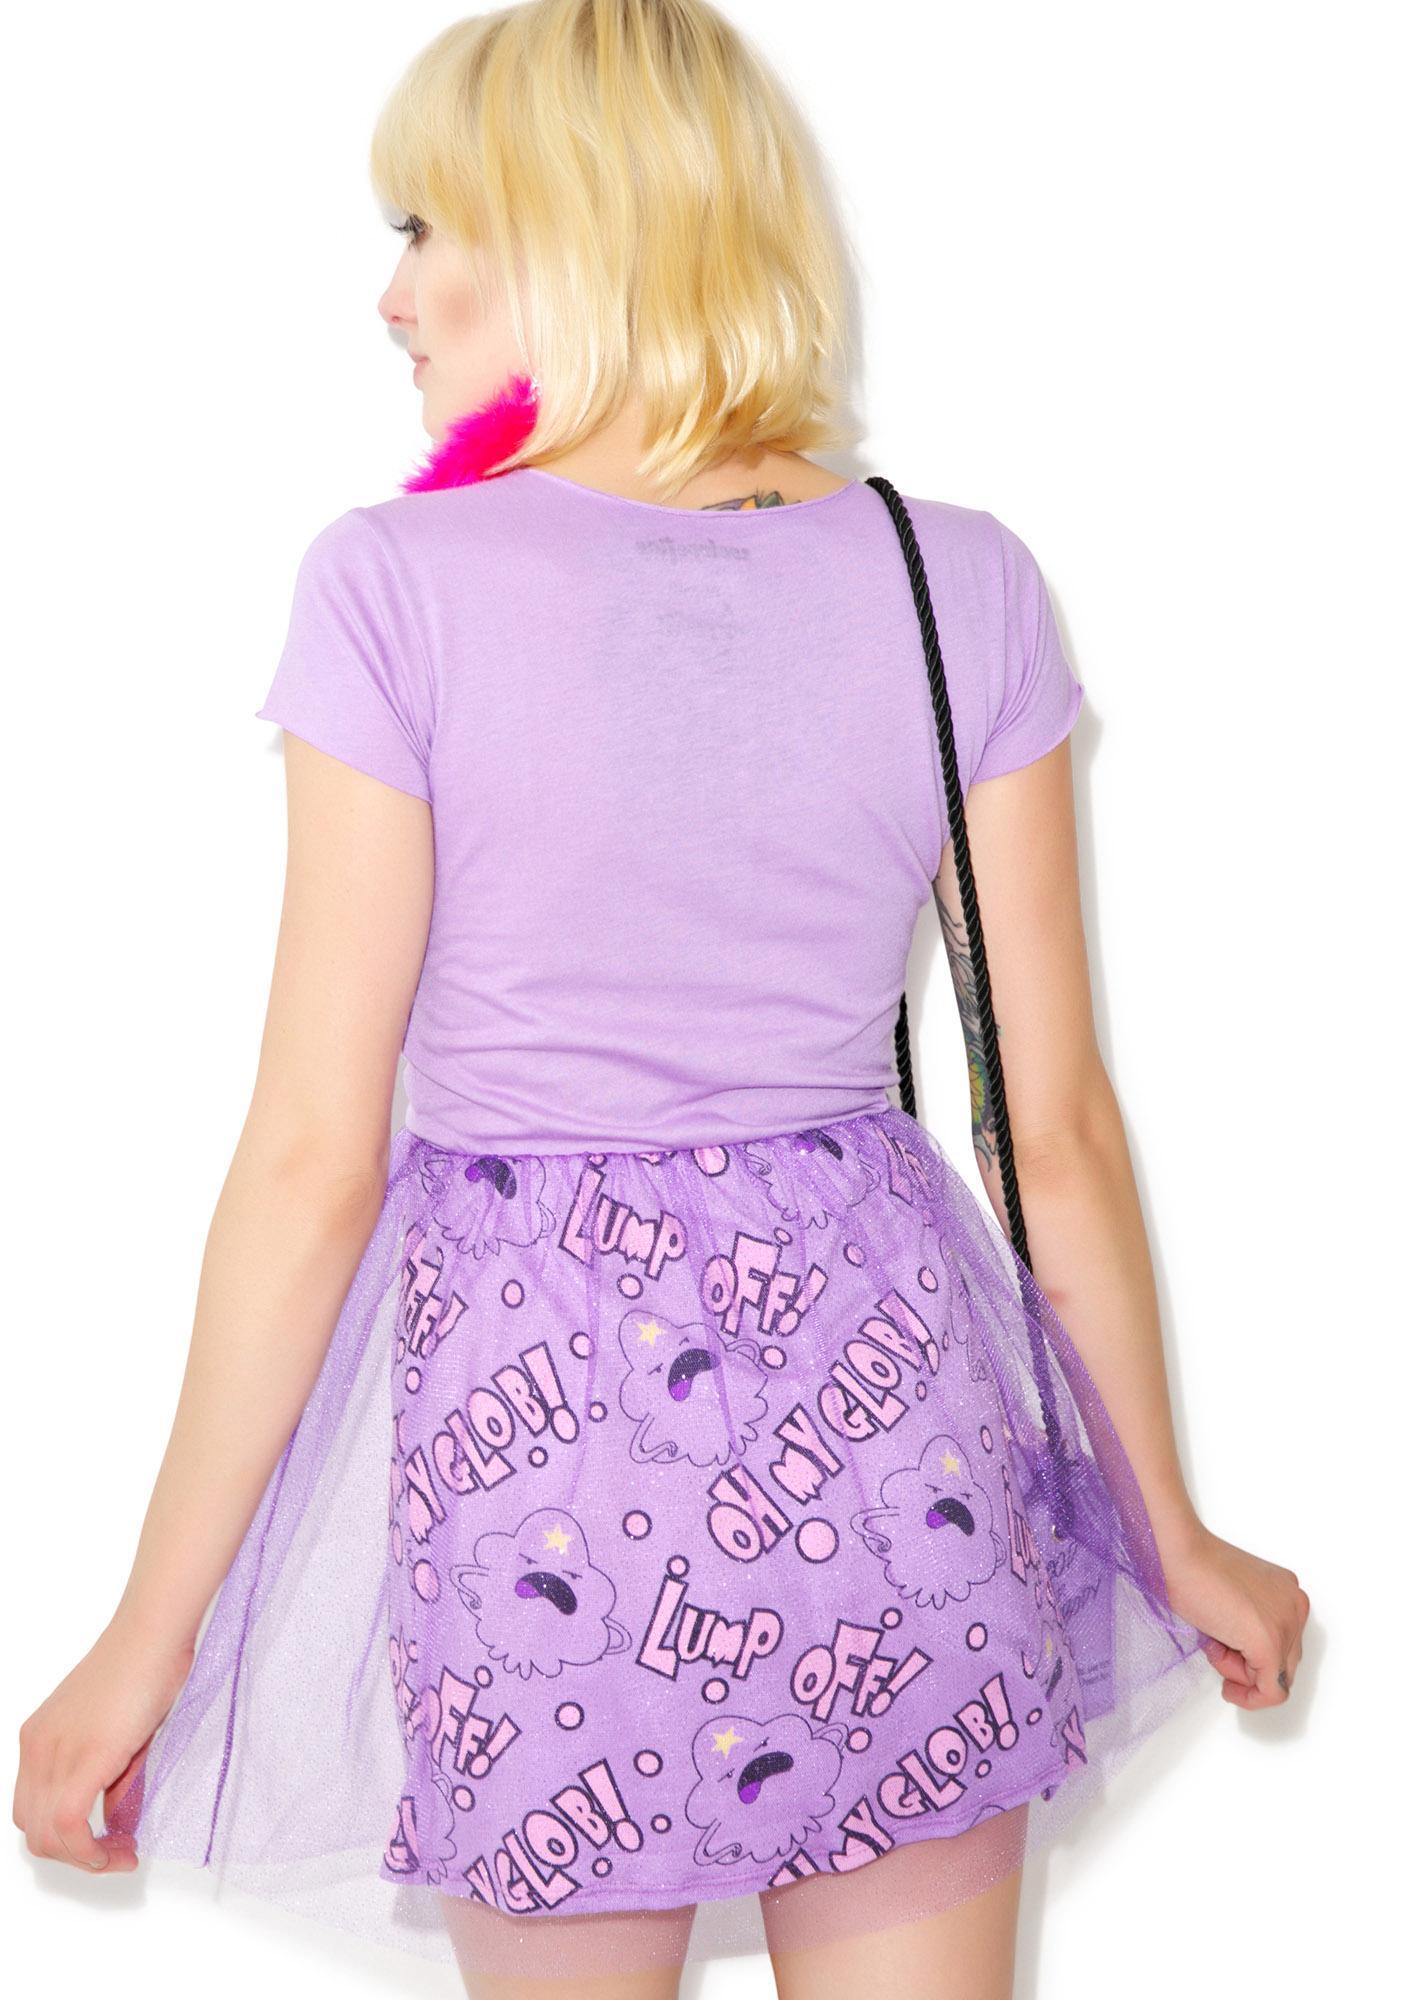 Lumpy Space Princess Tulle Dress